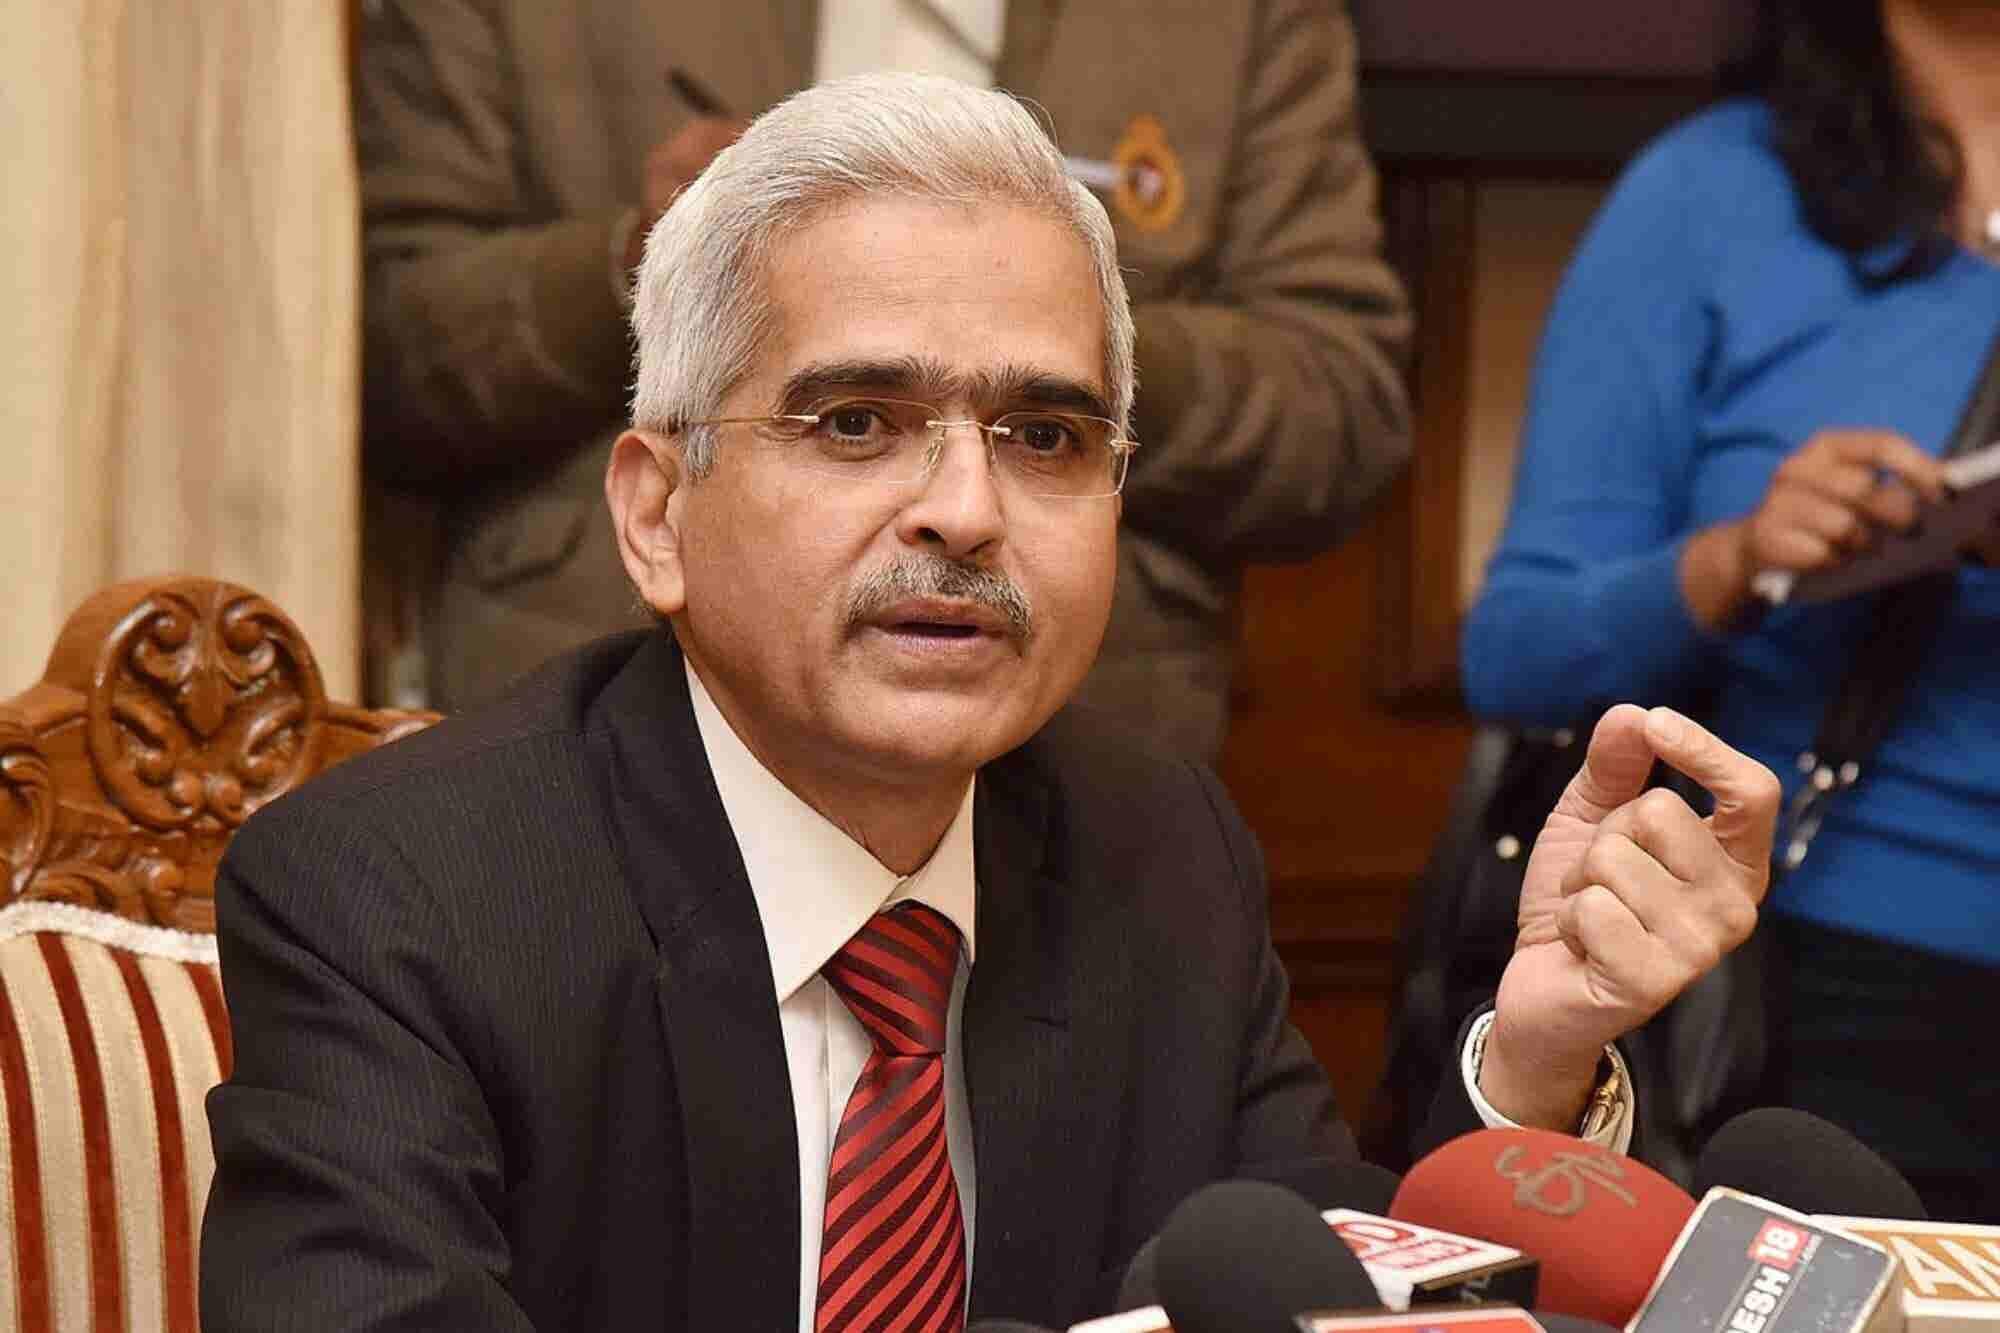 RBI to Consider Viability of MSME Loan Restructuring, Says Shaktikanta Das